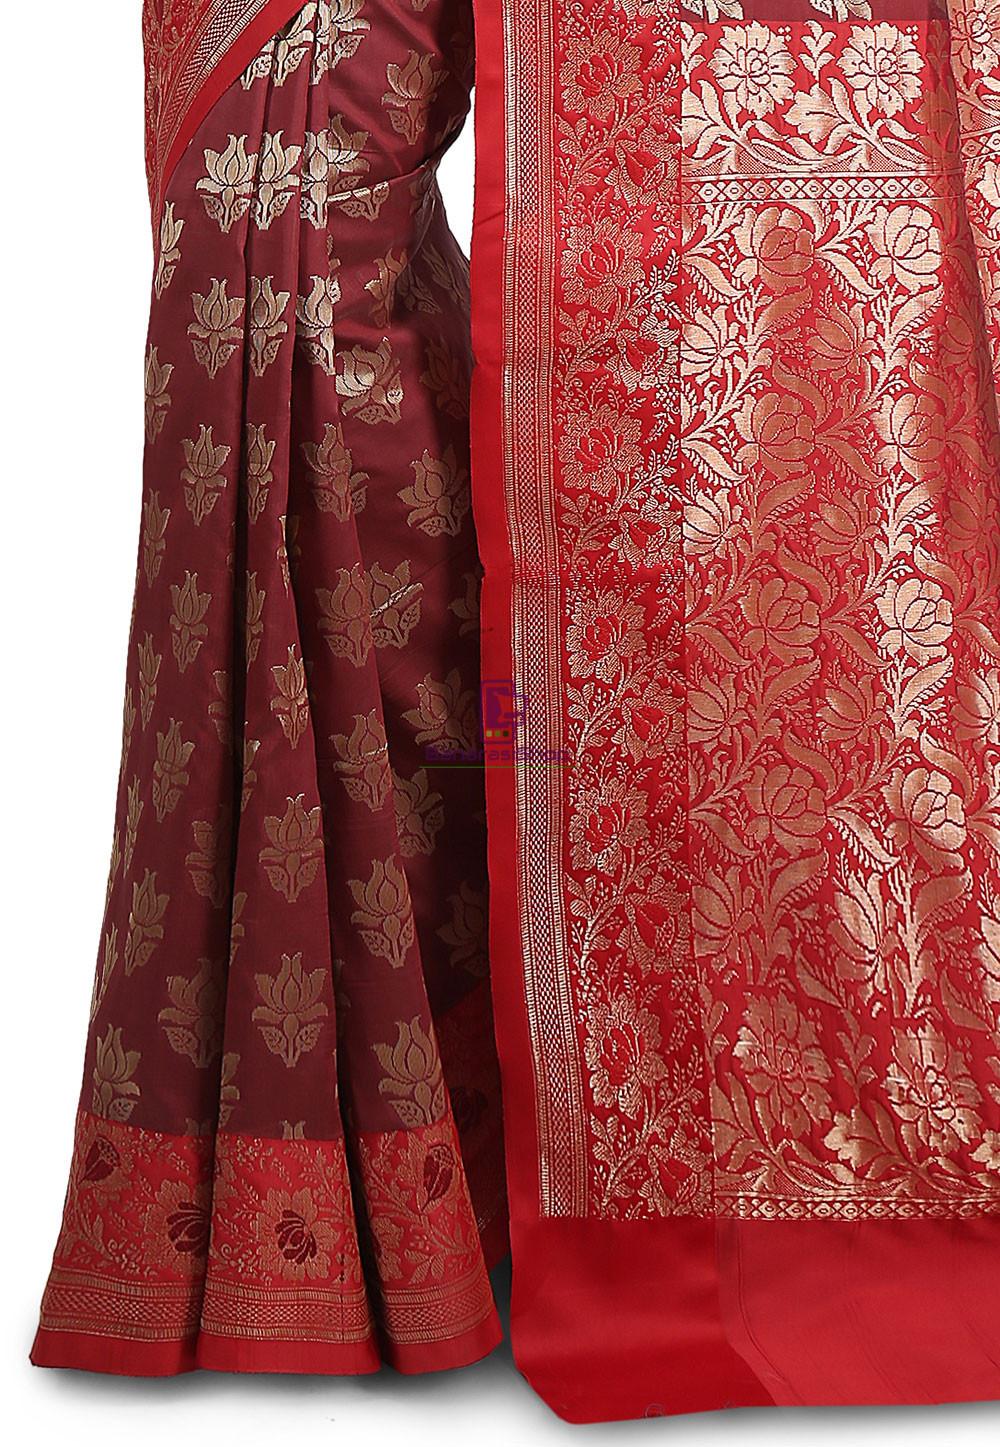 Woven Banarasi Art Silk Saree in Maroon and Red 3